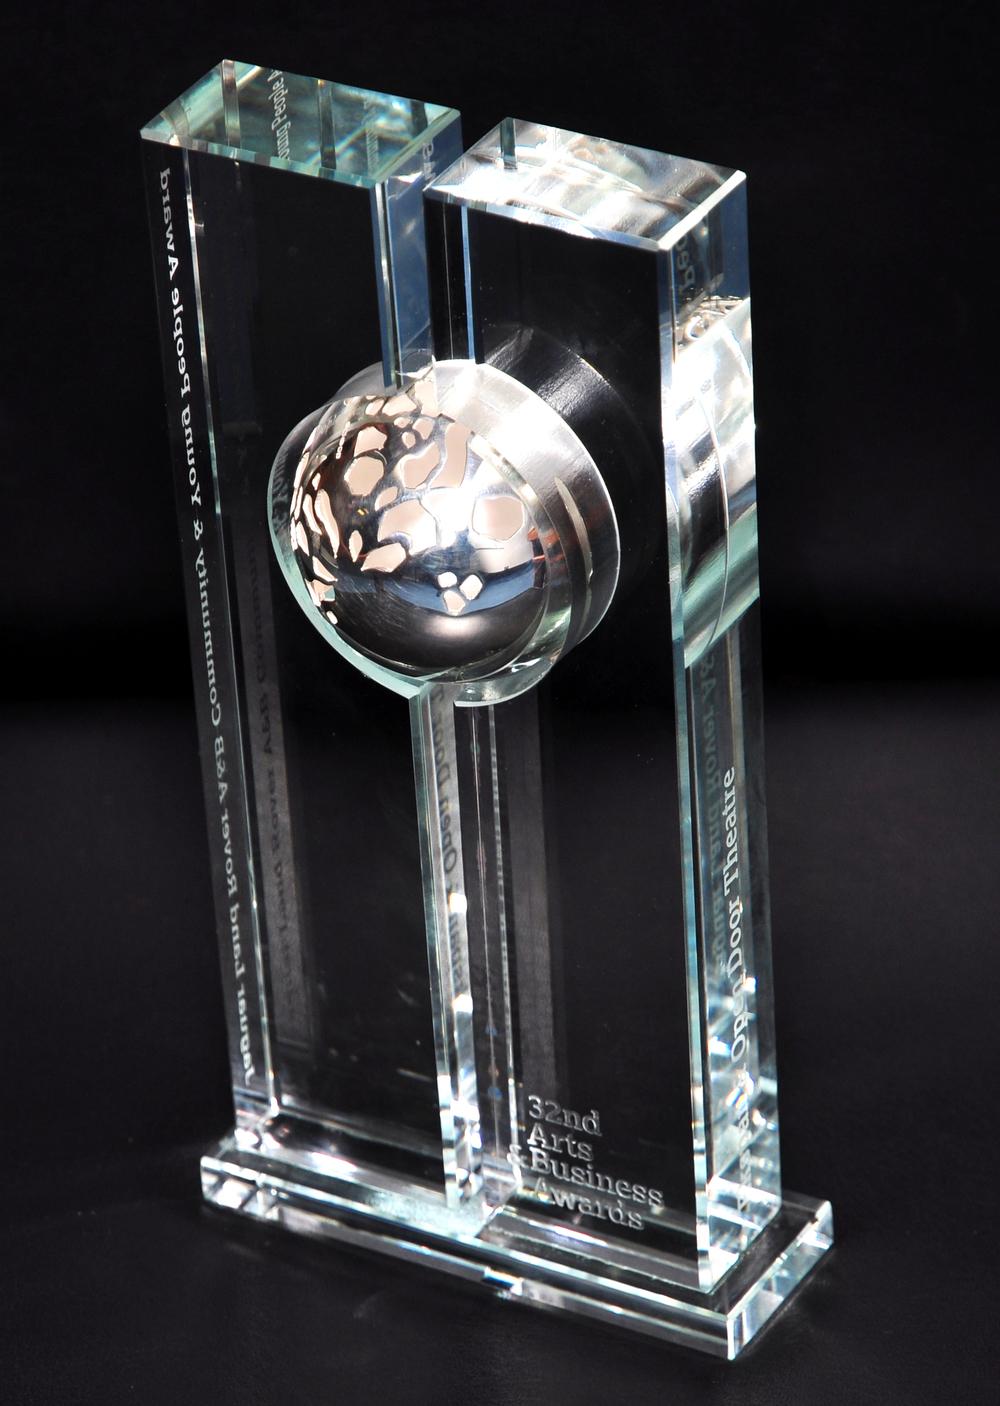 Jaguar Land Rover Arts & Business Community & Young People Award. OPEN DOOR THEATRE COMPANY & EKSPAN Ltd 2010